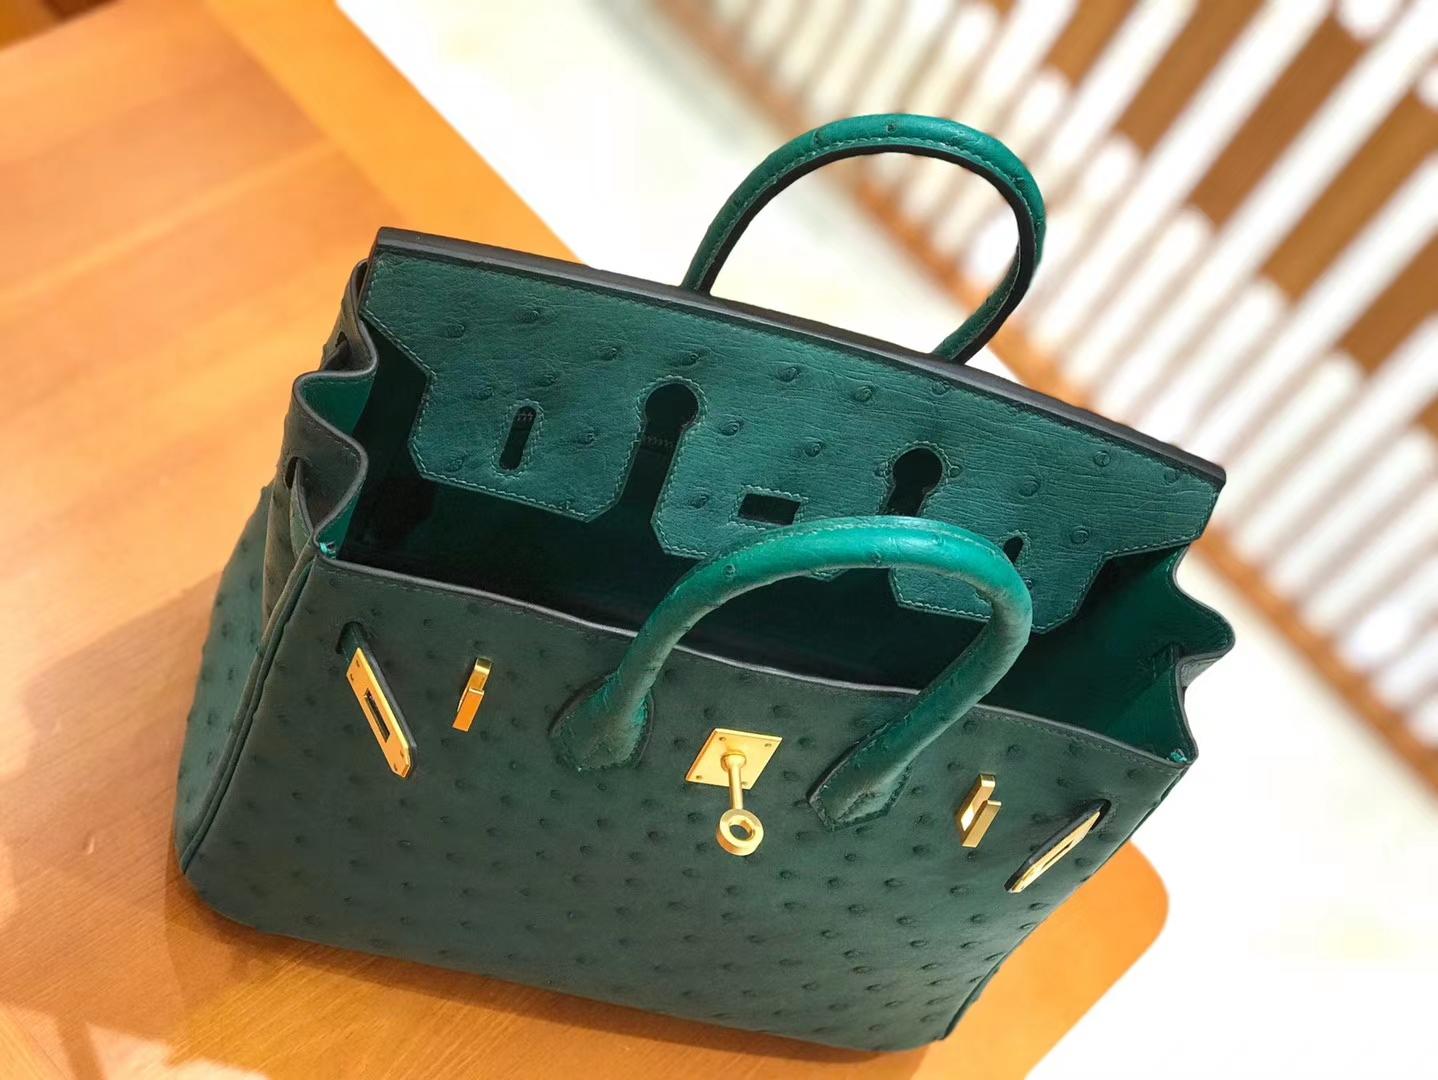 Hermès(爱马仕)Birkin 25cm 缇香绿拼墨绿 鸵鸟皮 全手工缝制